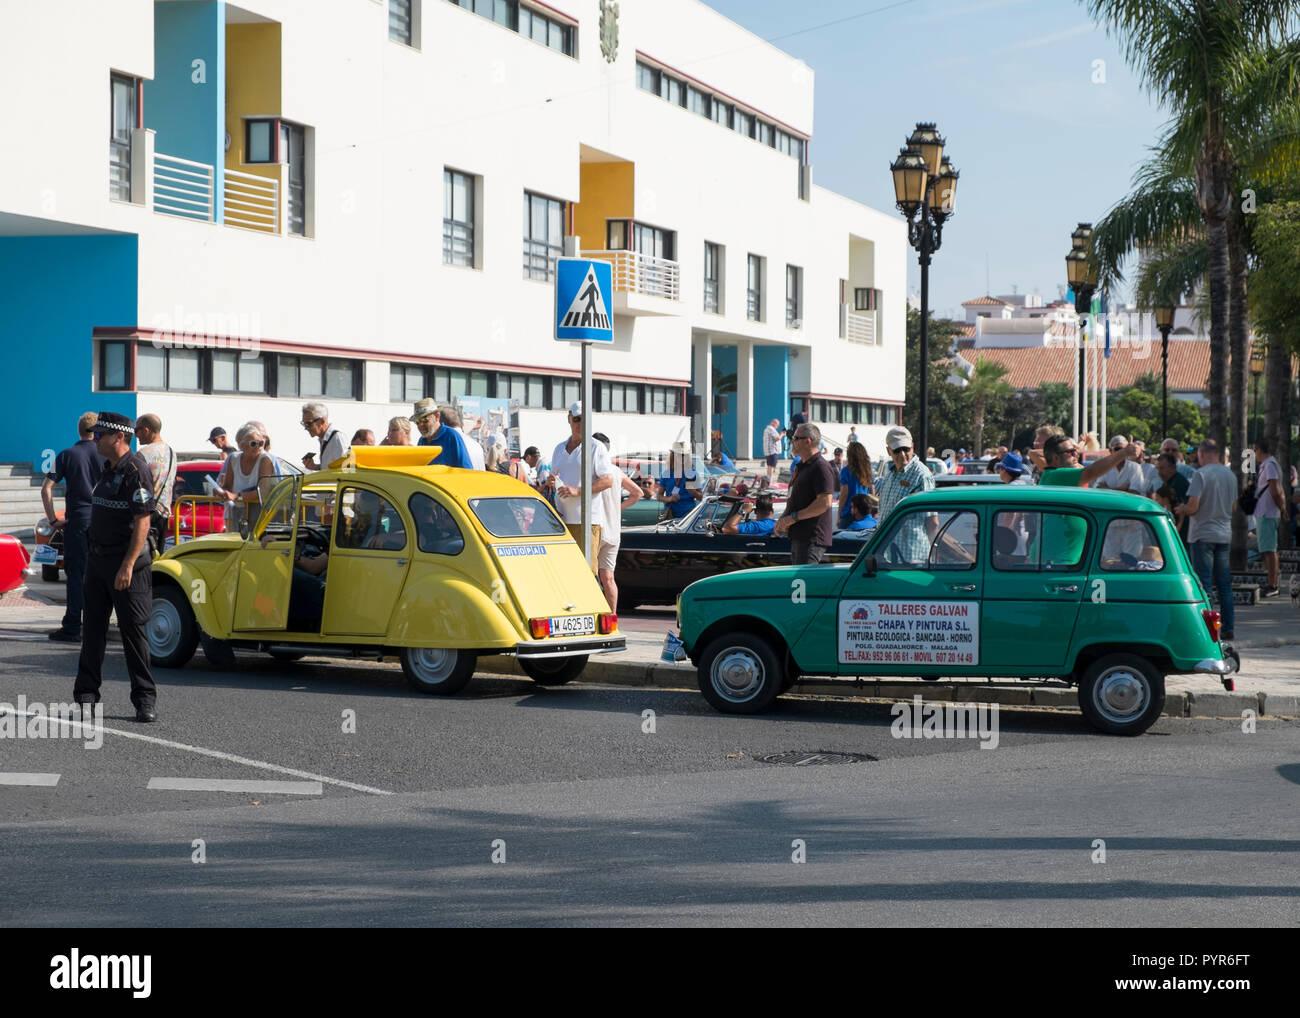 Citroën 2CV - Renault 4. Reunión de coches clásicos en Torremolinos, Málaga, España. Foto de stock